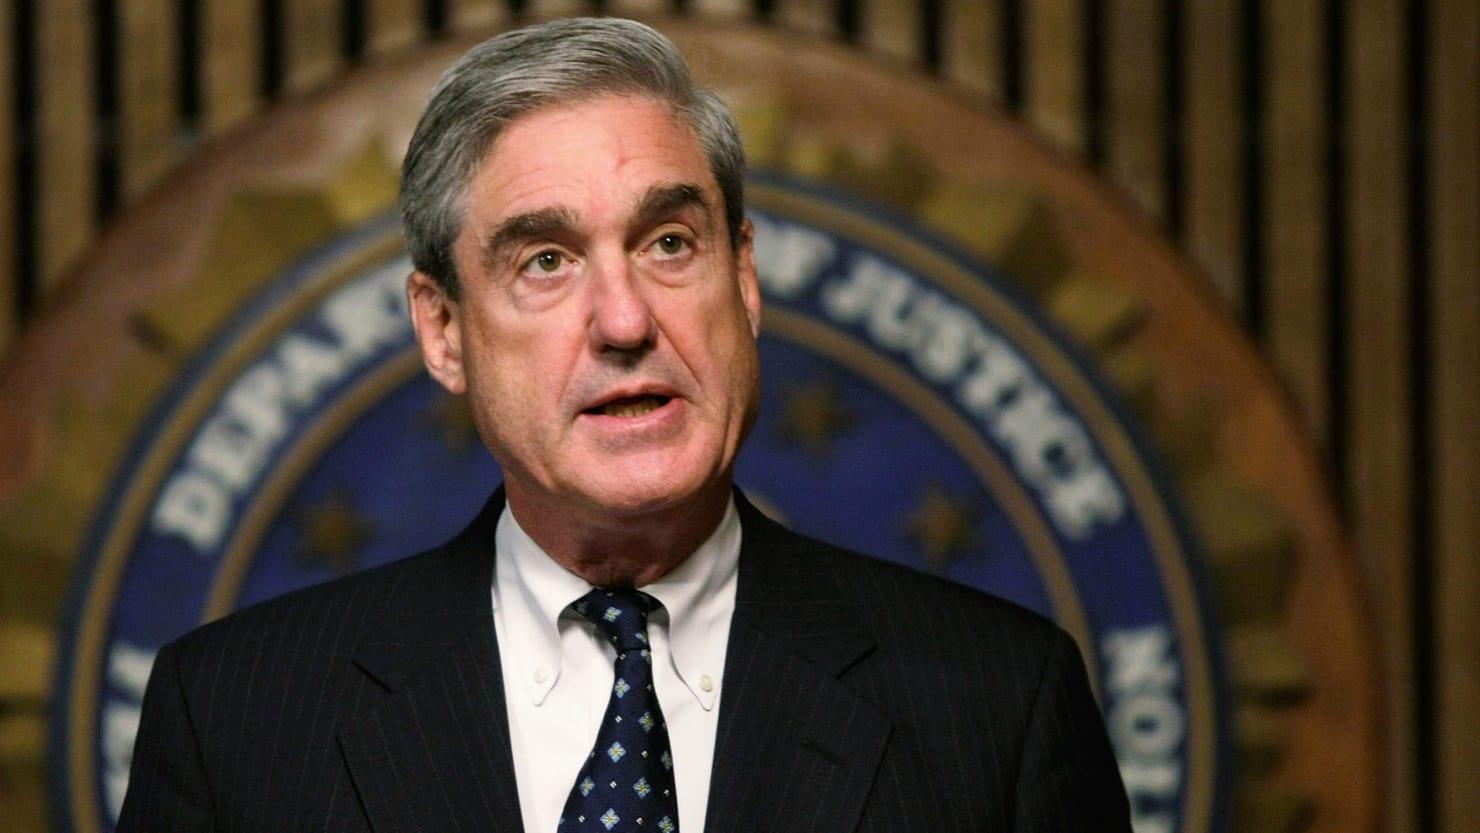 CNN: Mueller Hands Off Inquiry Into Obama's Ex-Lawyer